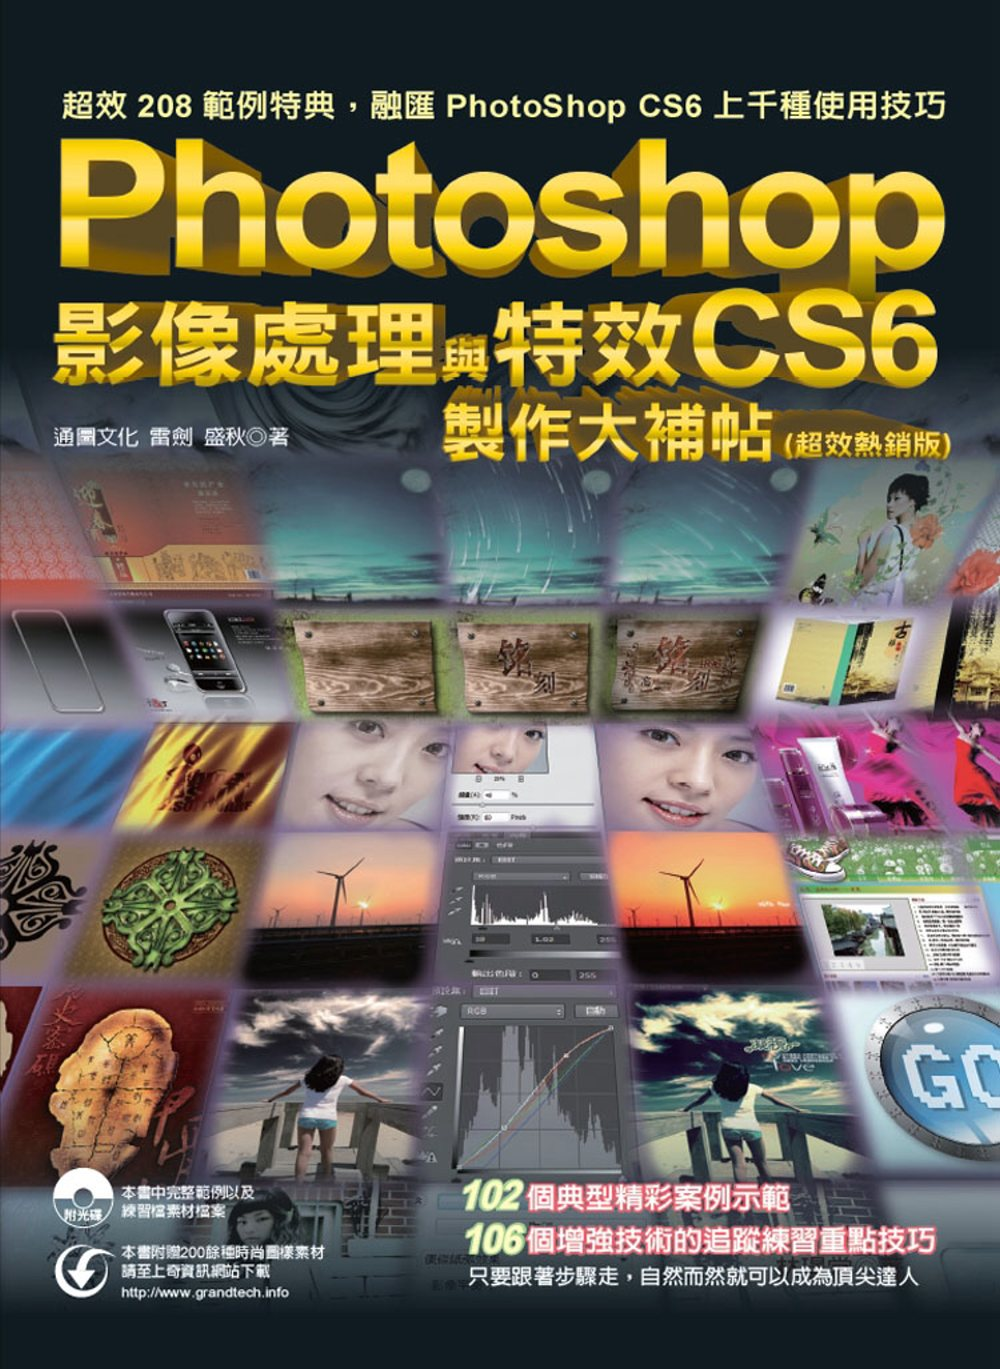 Photoshop CS6 影像處理與特效製作大補帖(超效熱銷版)(二版)